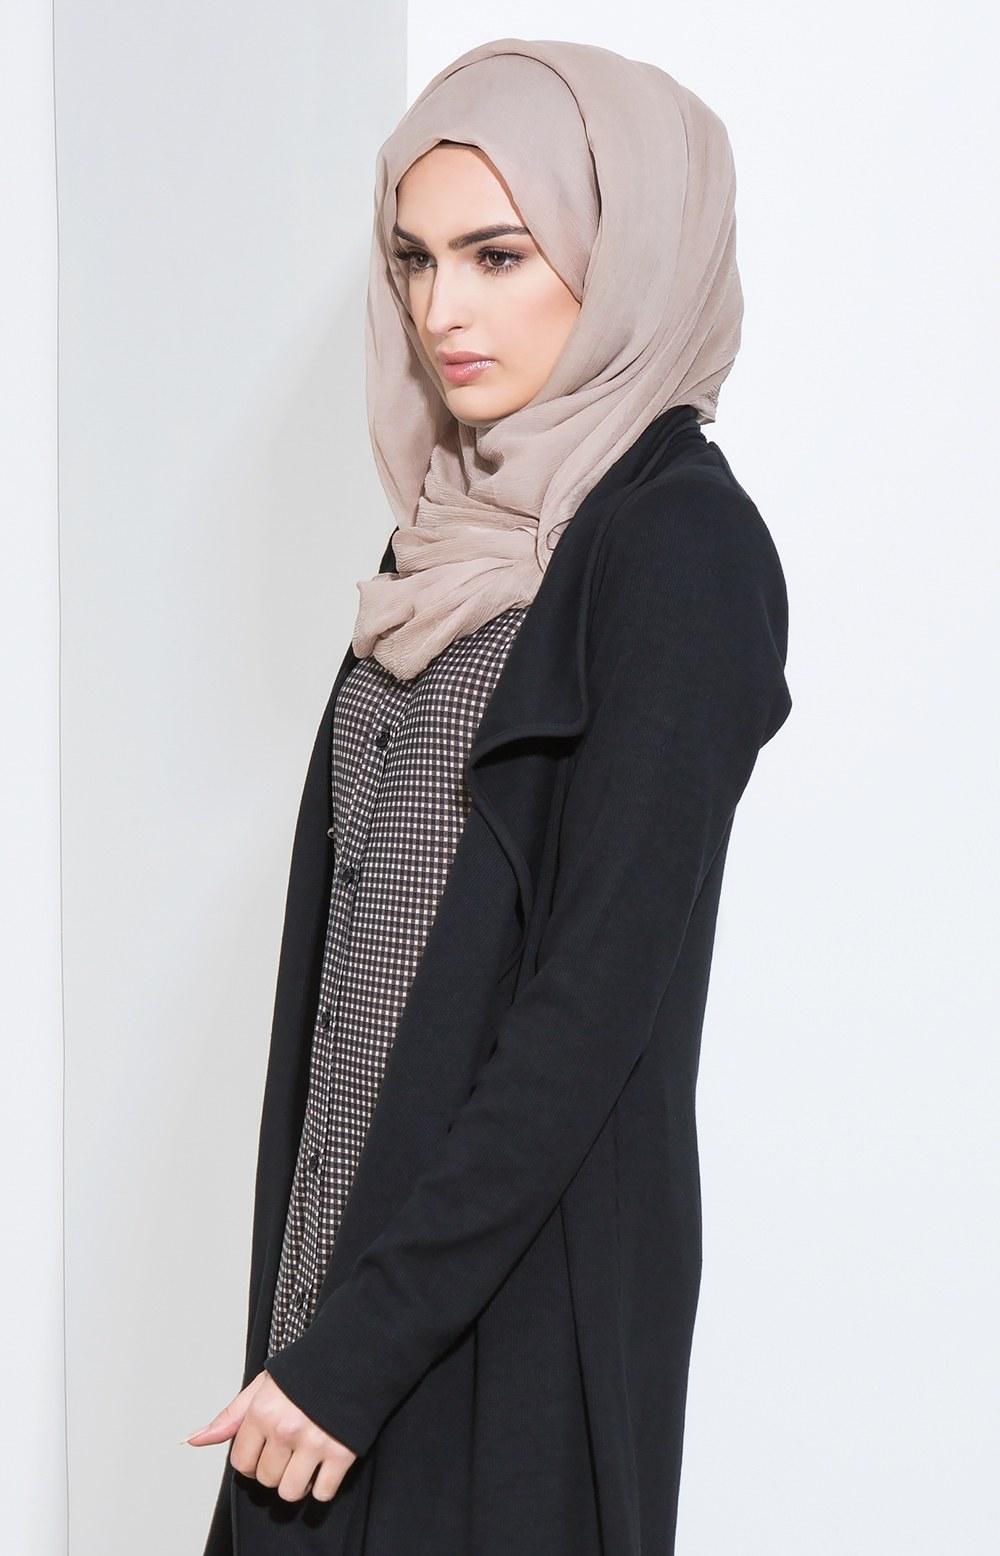 Bentuk Model Baju Lebaran Dian Pelangi 2018 Drdp 25 Trend Model Baju Muslim Lebaran 2018 Simple & Modis